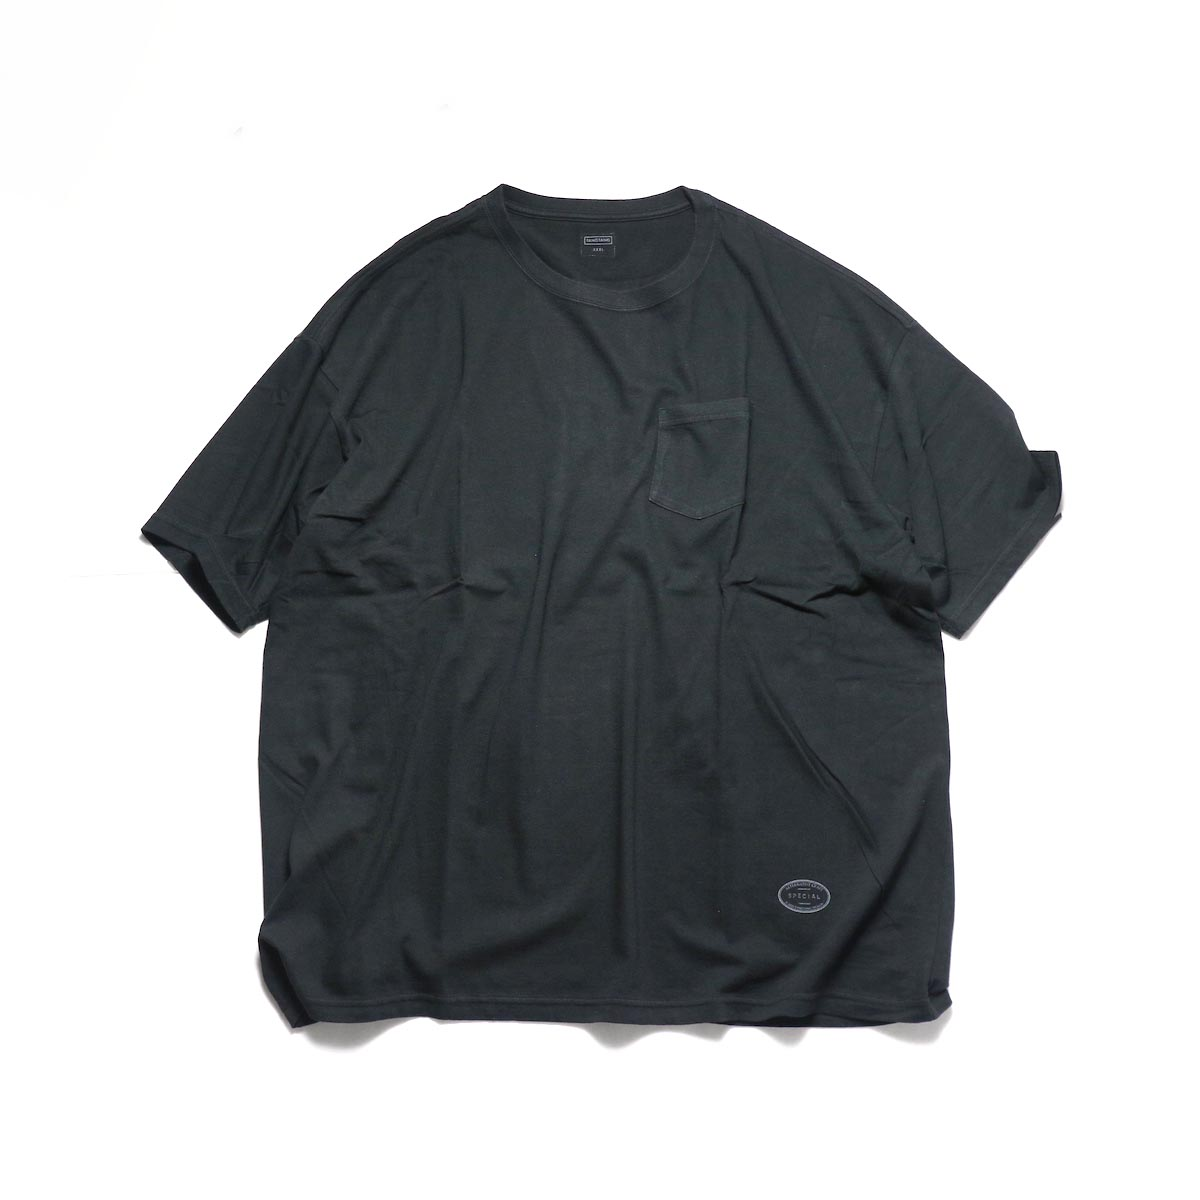 TANGTANG / POCKET -OVERSIZE (Black)